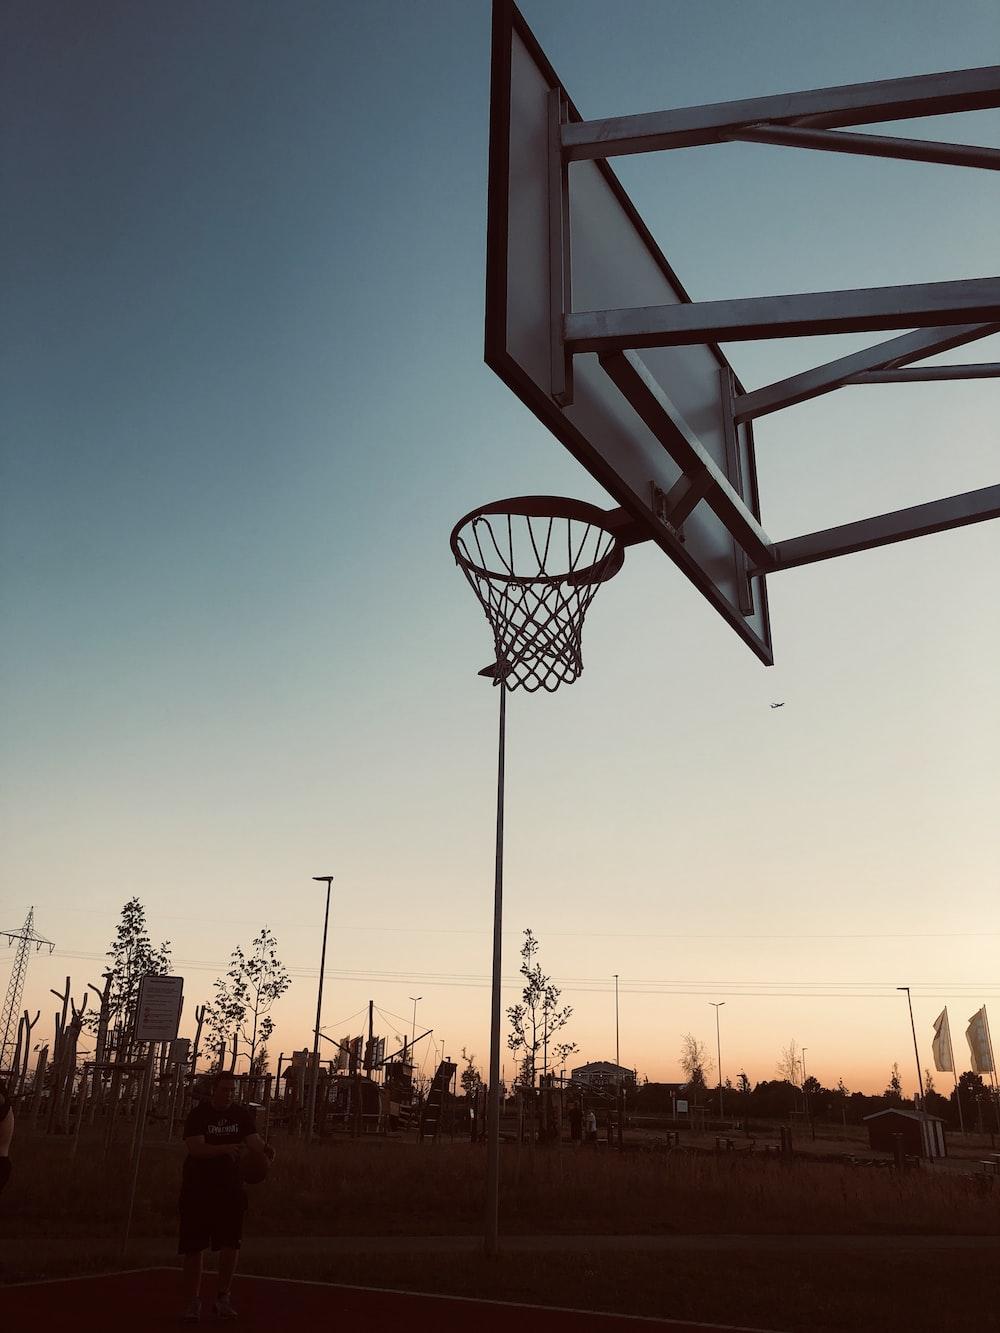 basketball court during sunset